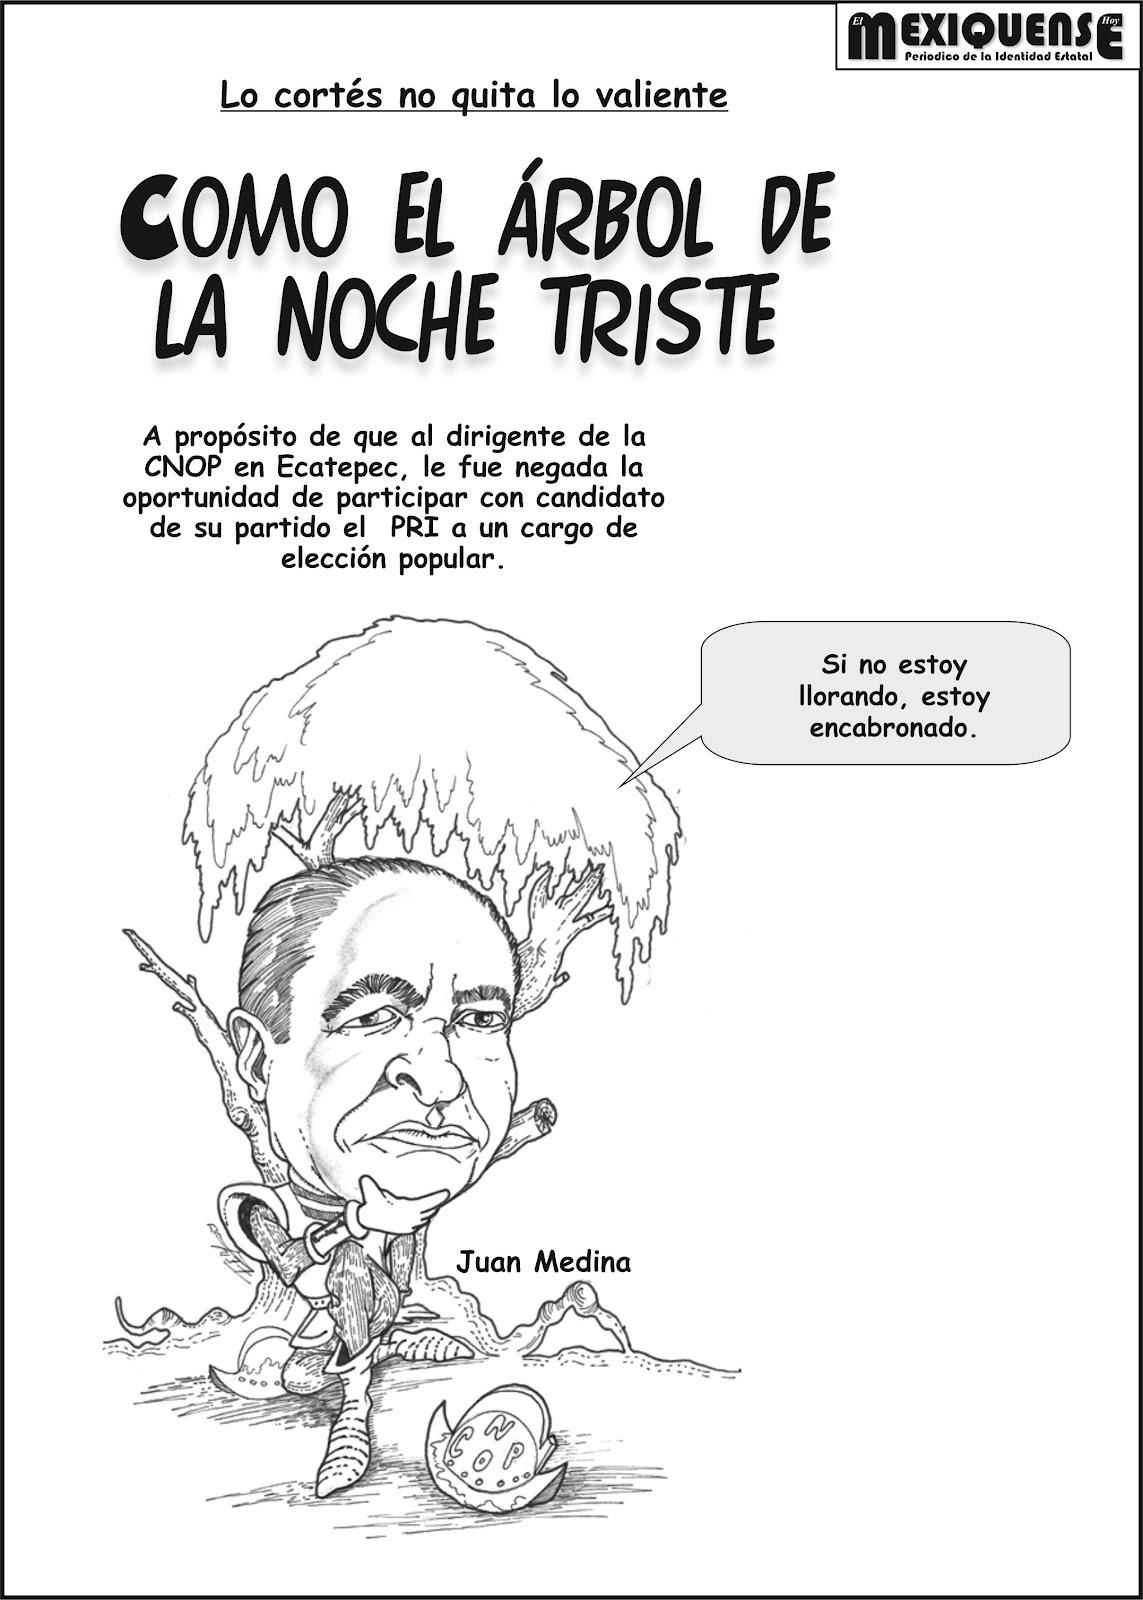 El mexiquense Hoy: 23-abr-2012